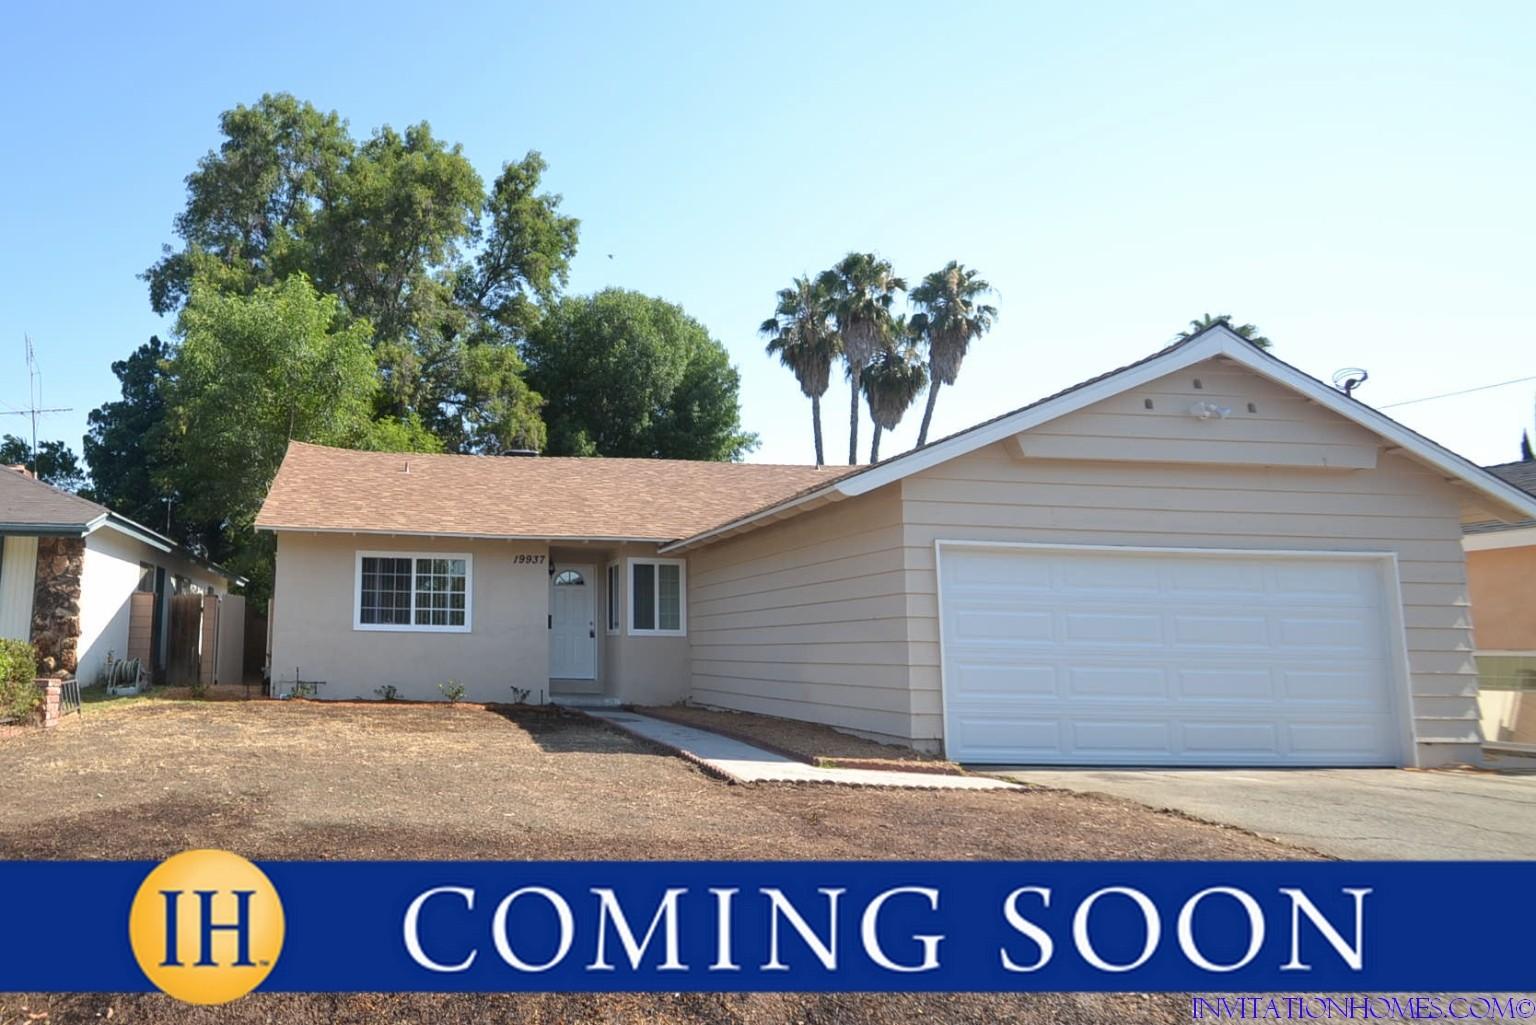 Ingomar St Los Angeles CA 3 Bedroom House for Rent for $2 777 m